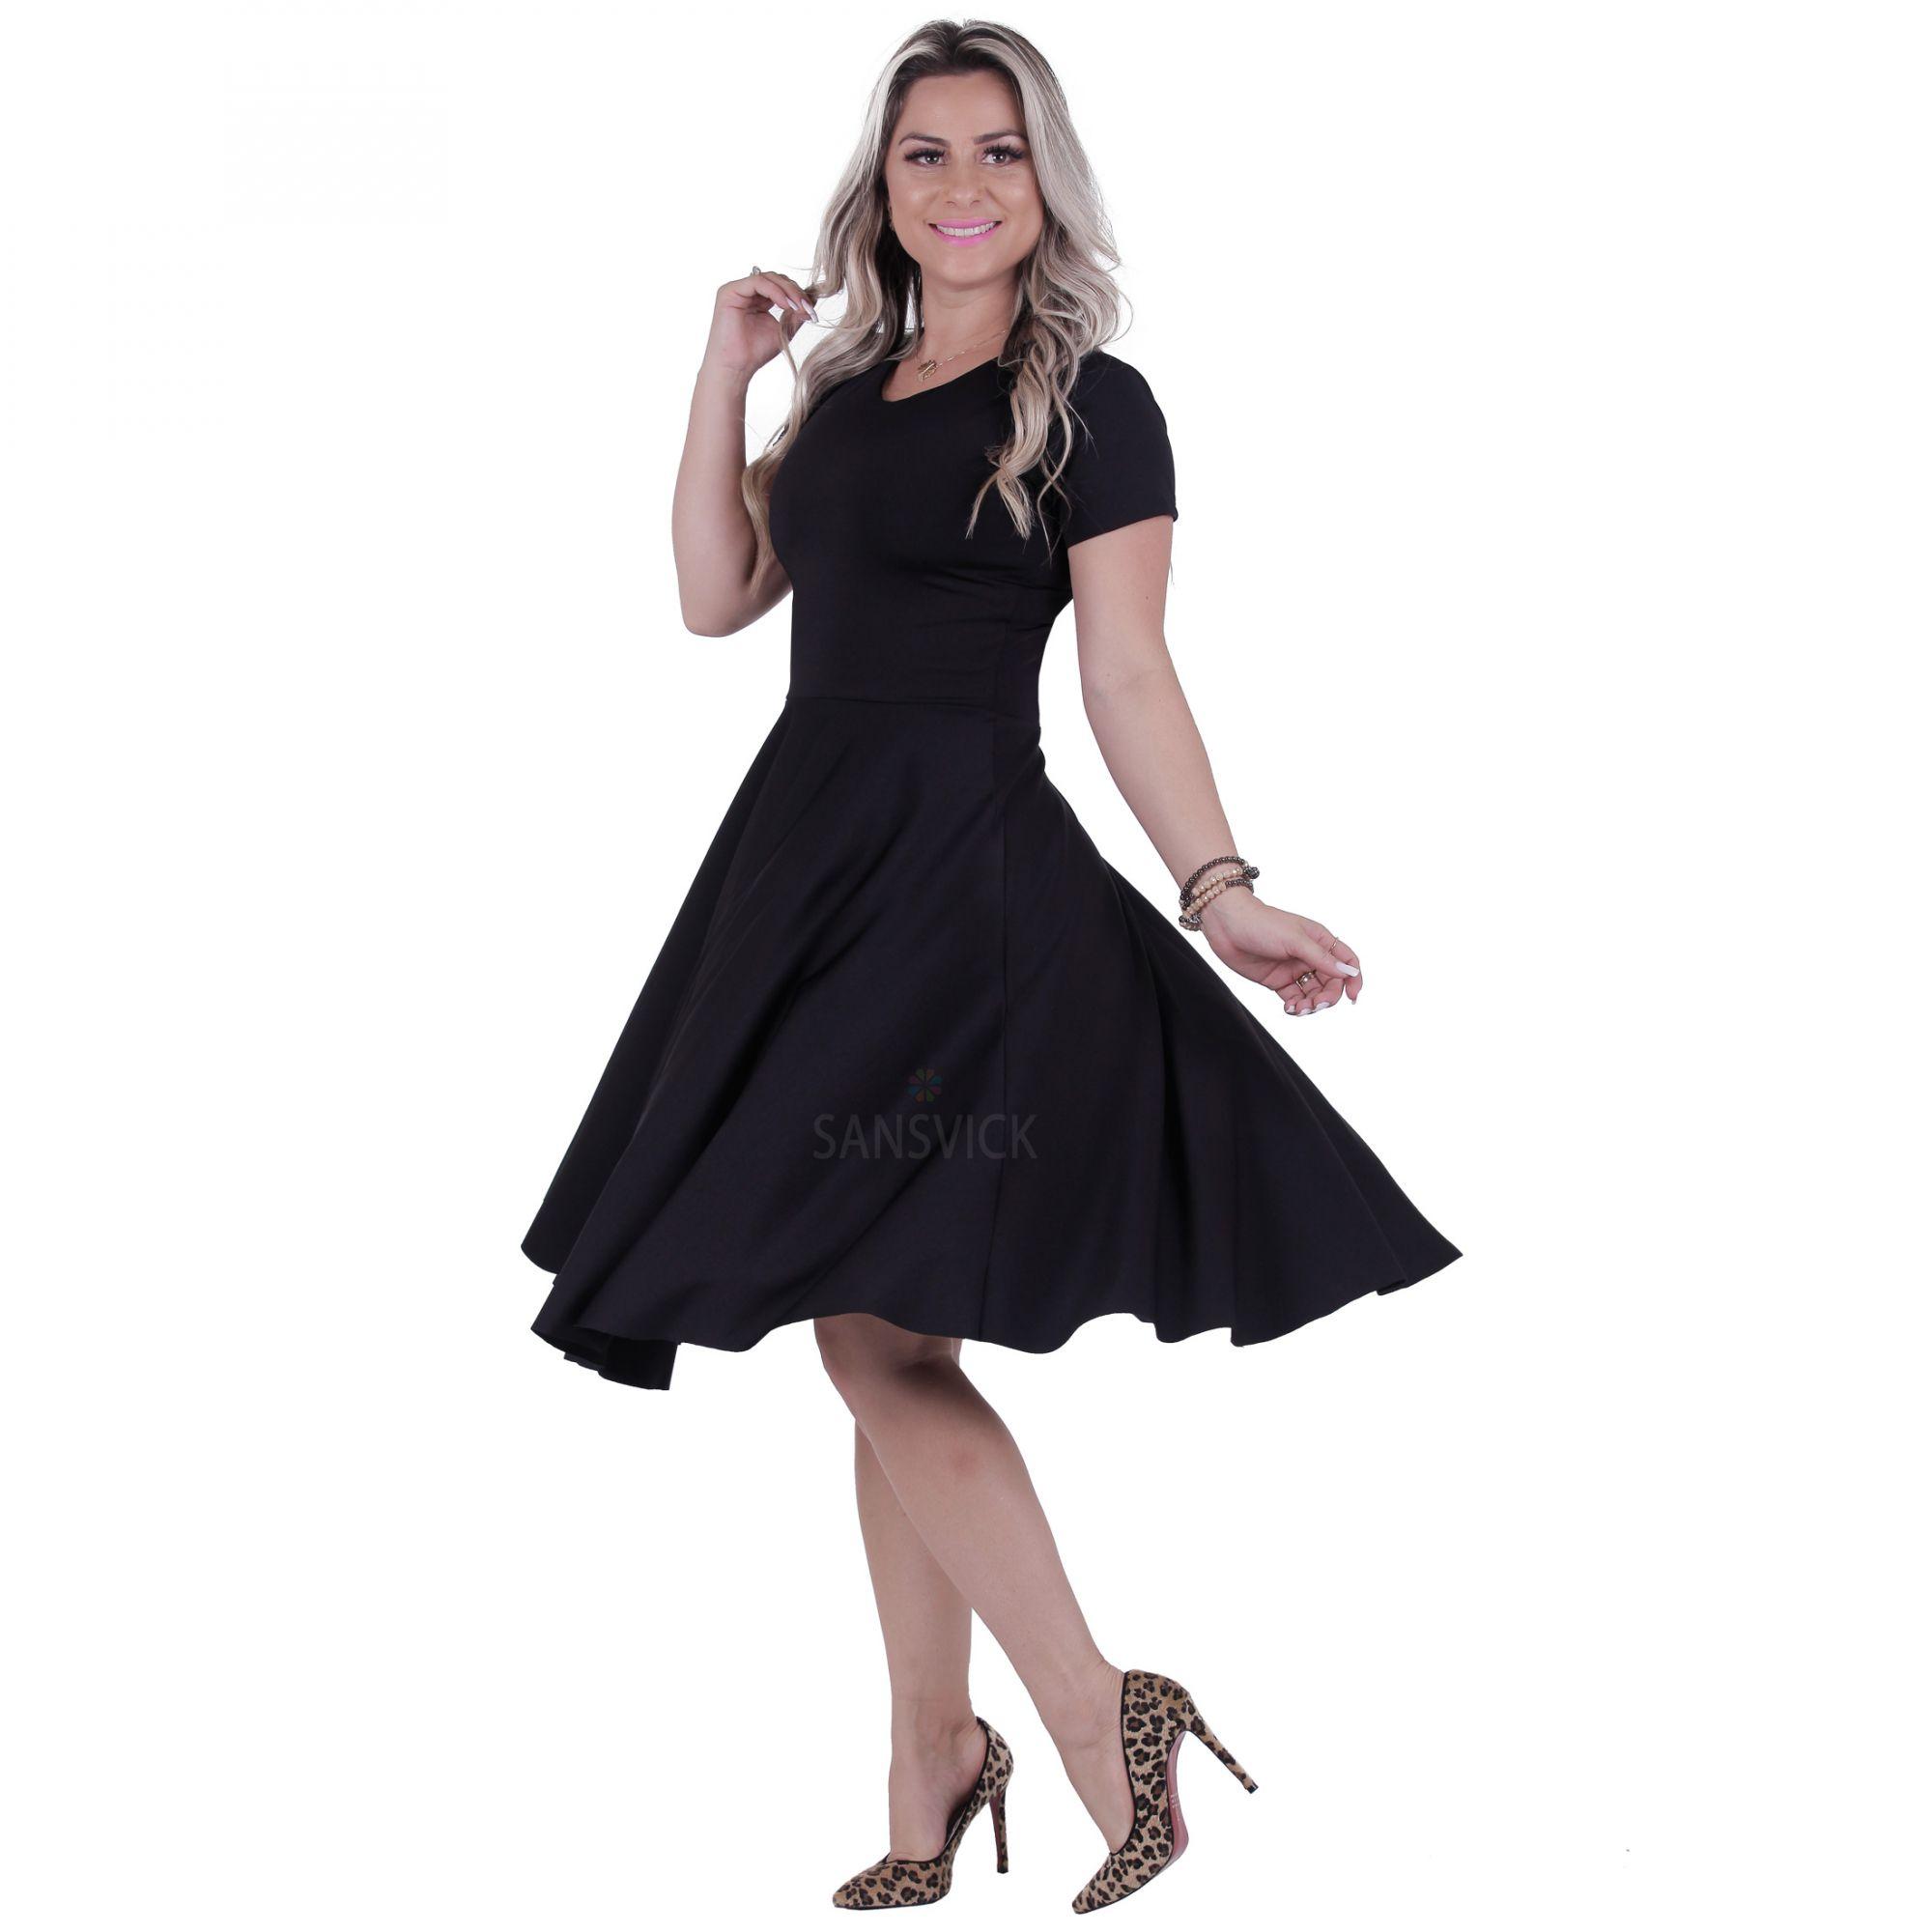 f519638f8ffe Vestido Midi Godê Preto com Cinto - Sansvick Store - Moda Evangélica ...